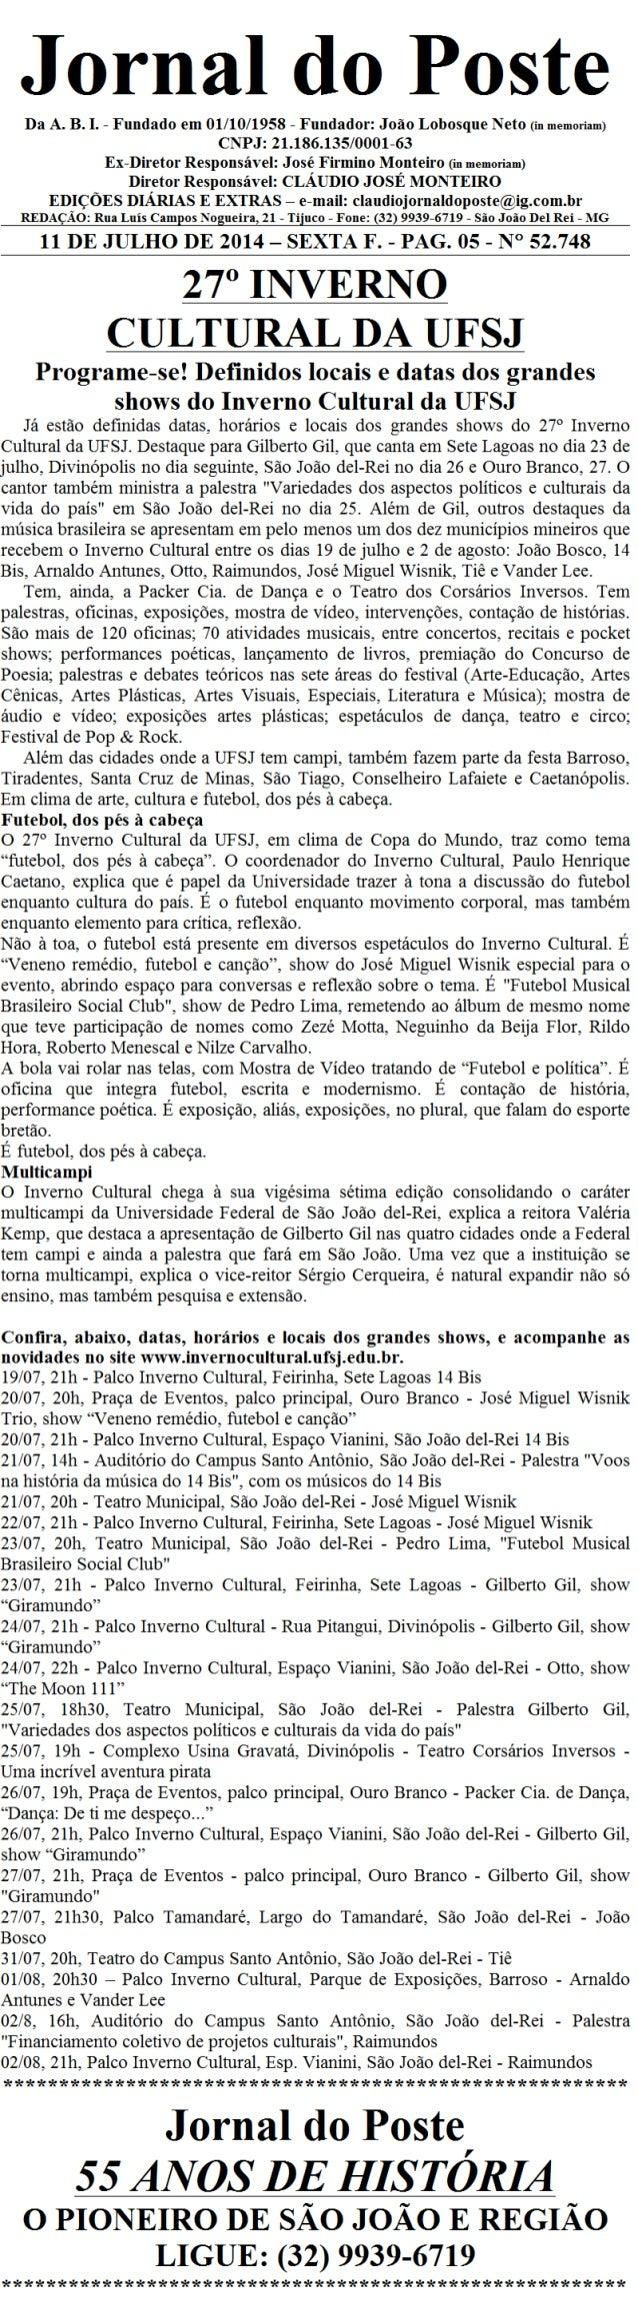 Jornal do poste 44 b 4